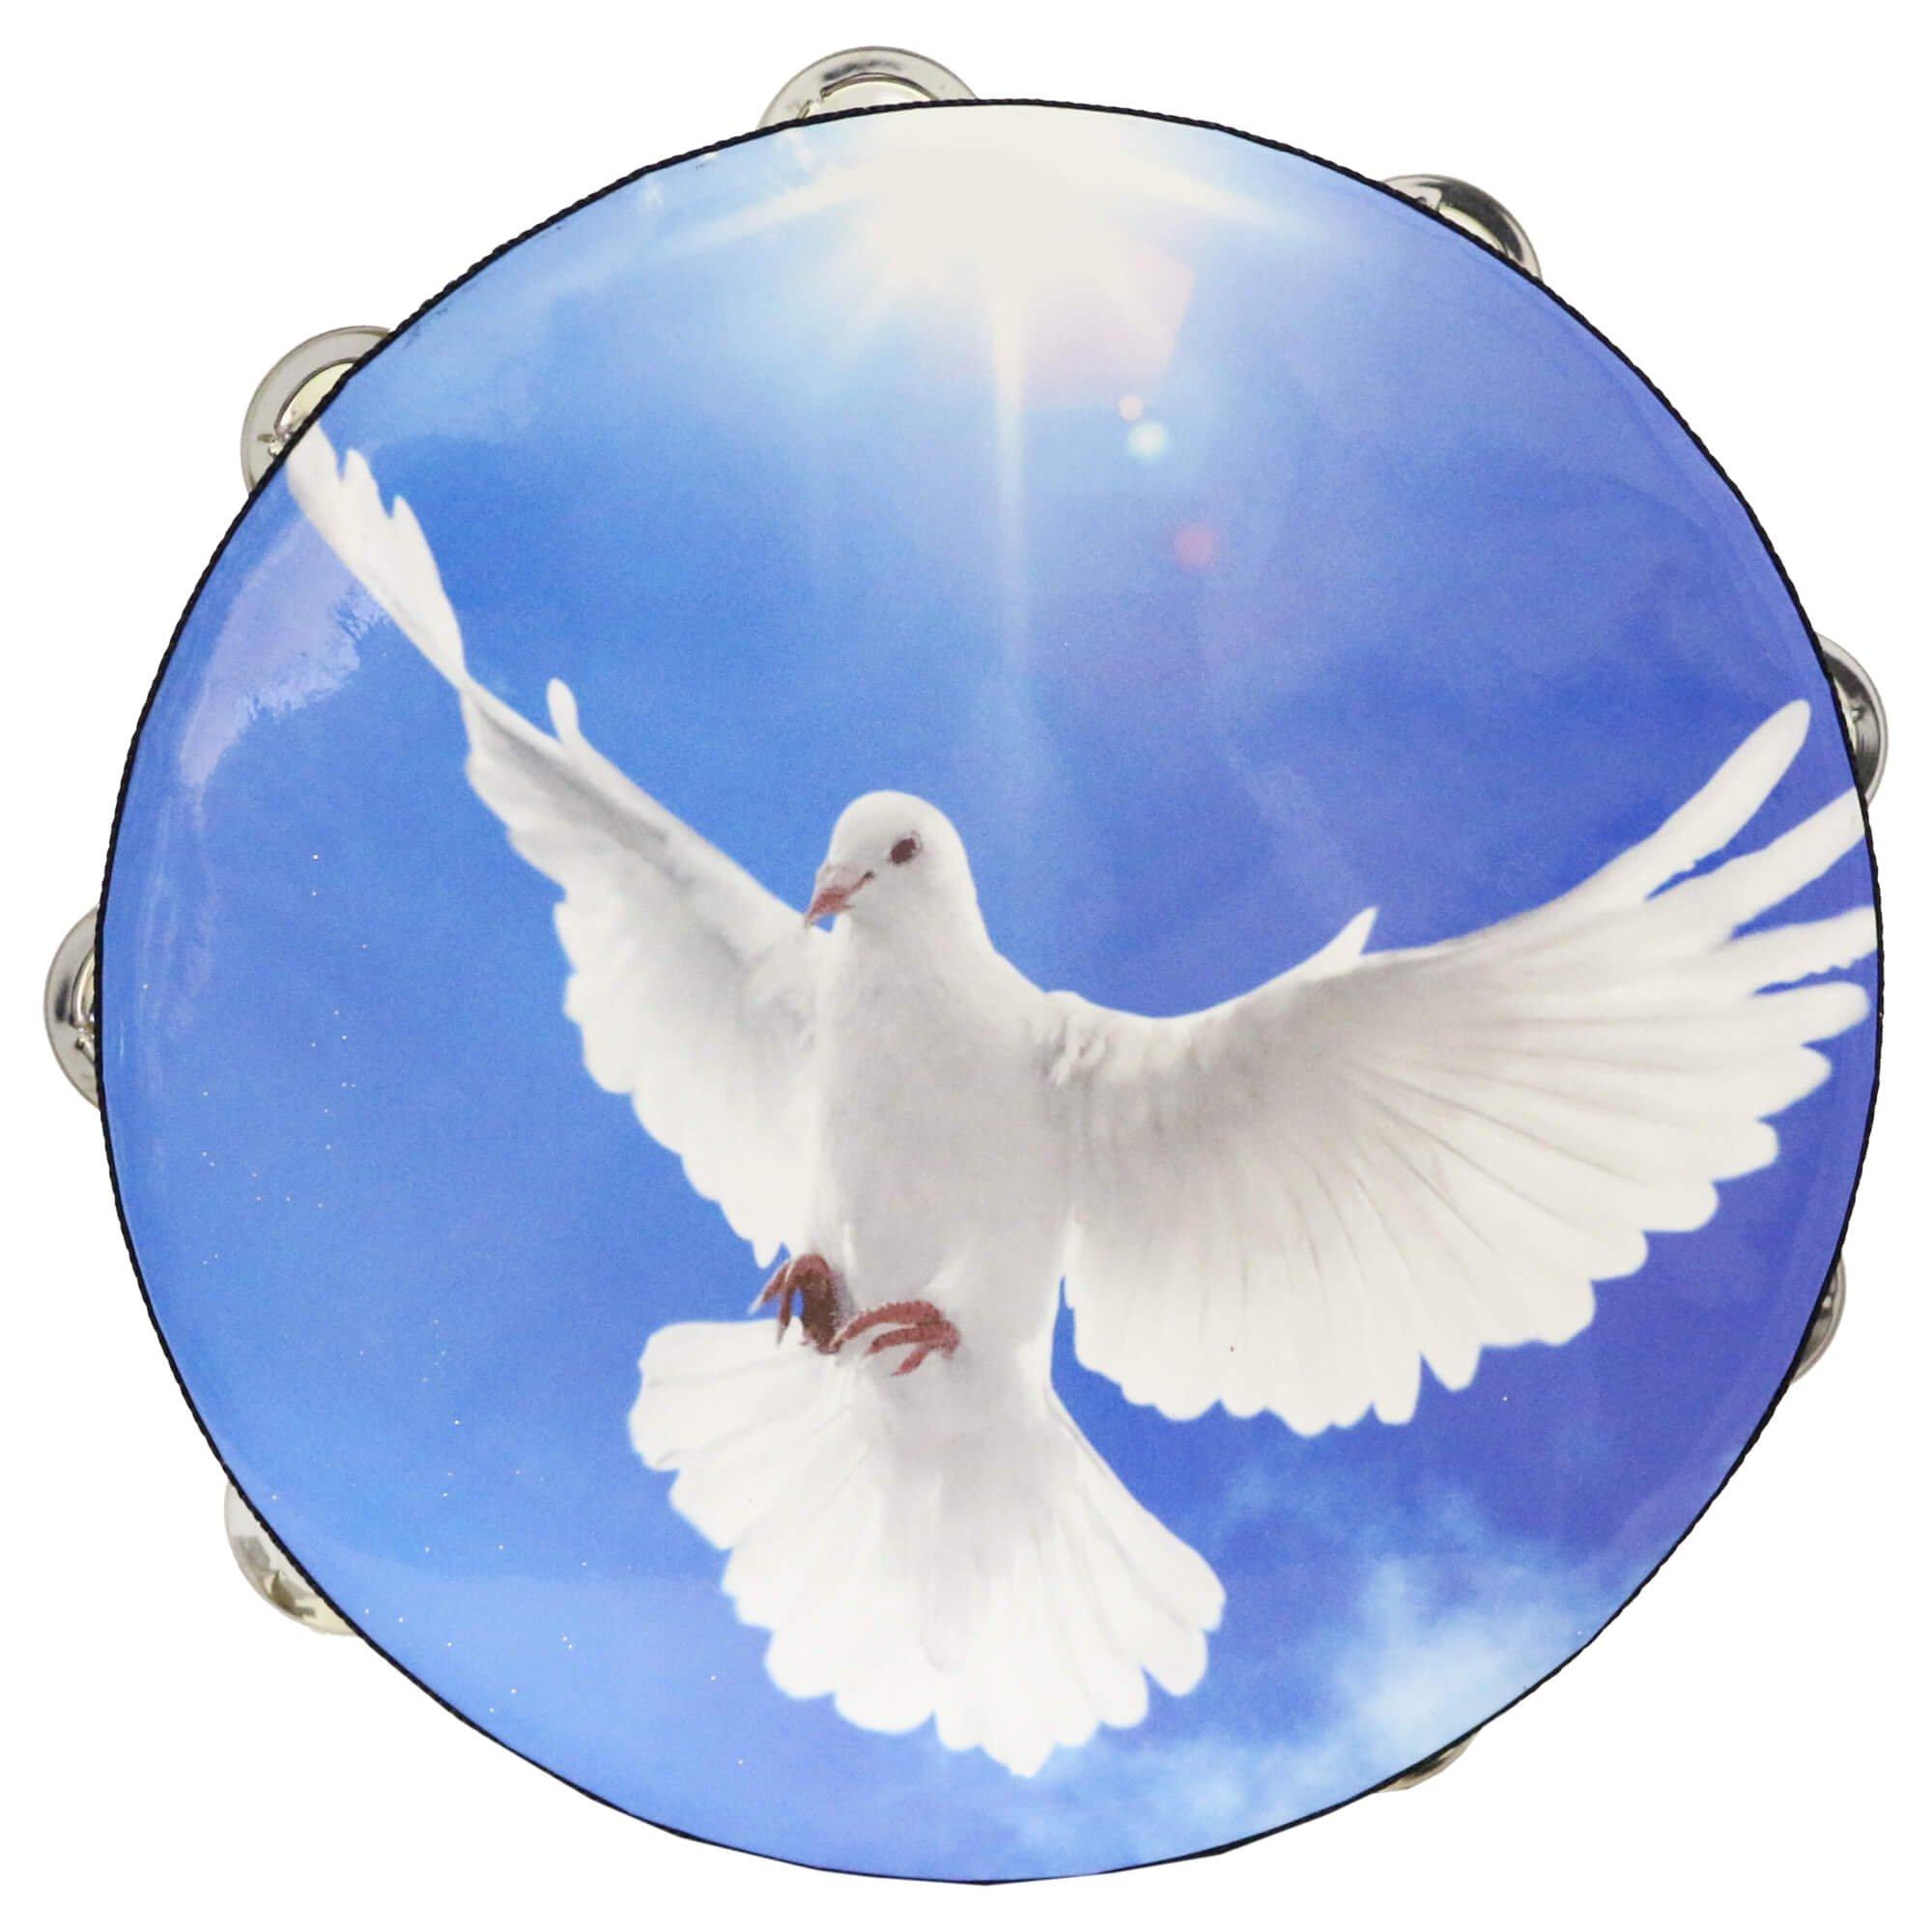 Danzcue Worship Dove Double Rows Jingles Tambourine